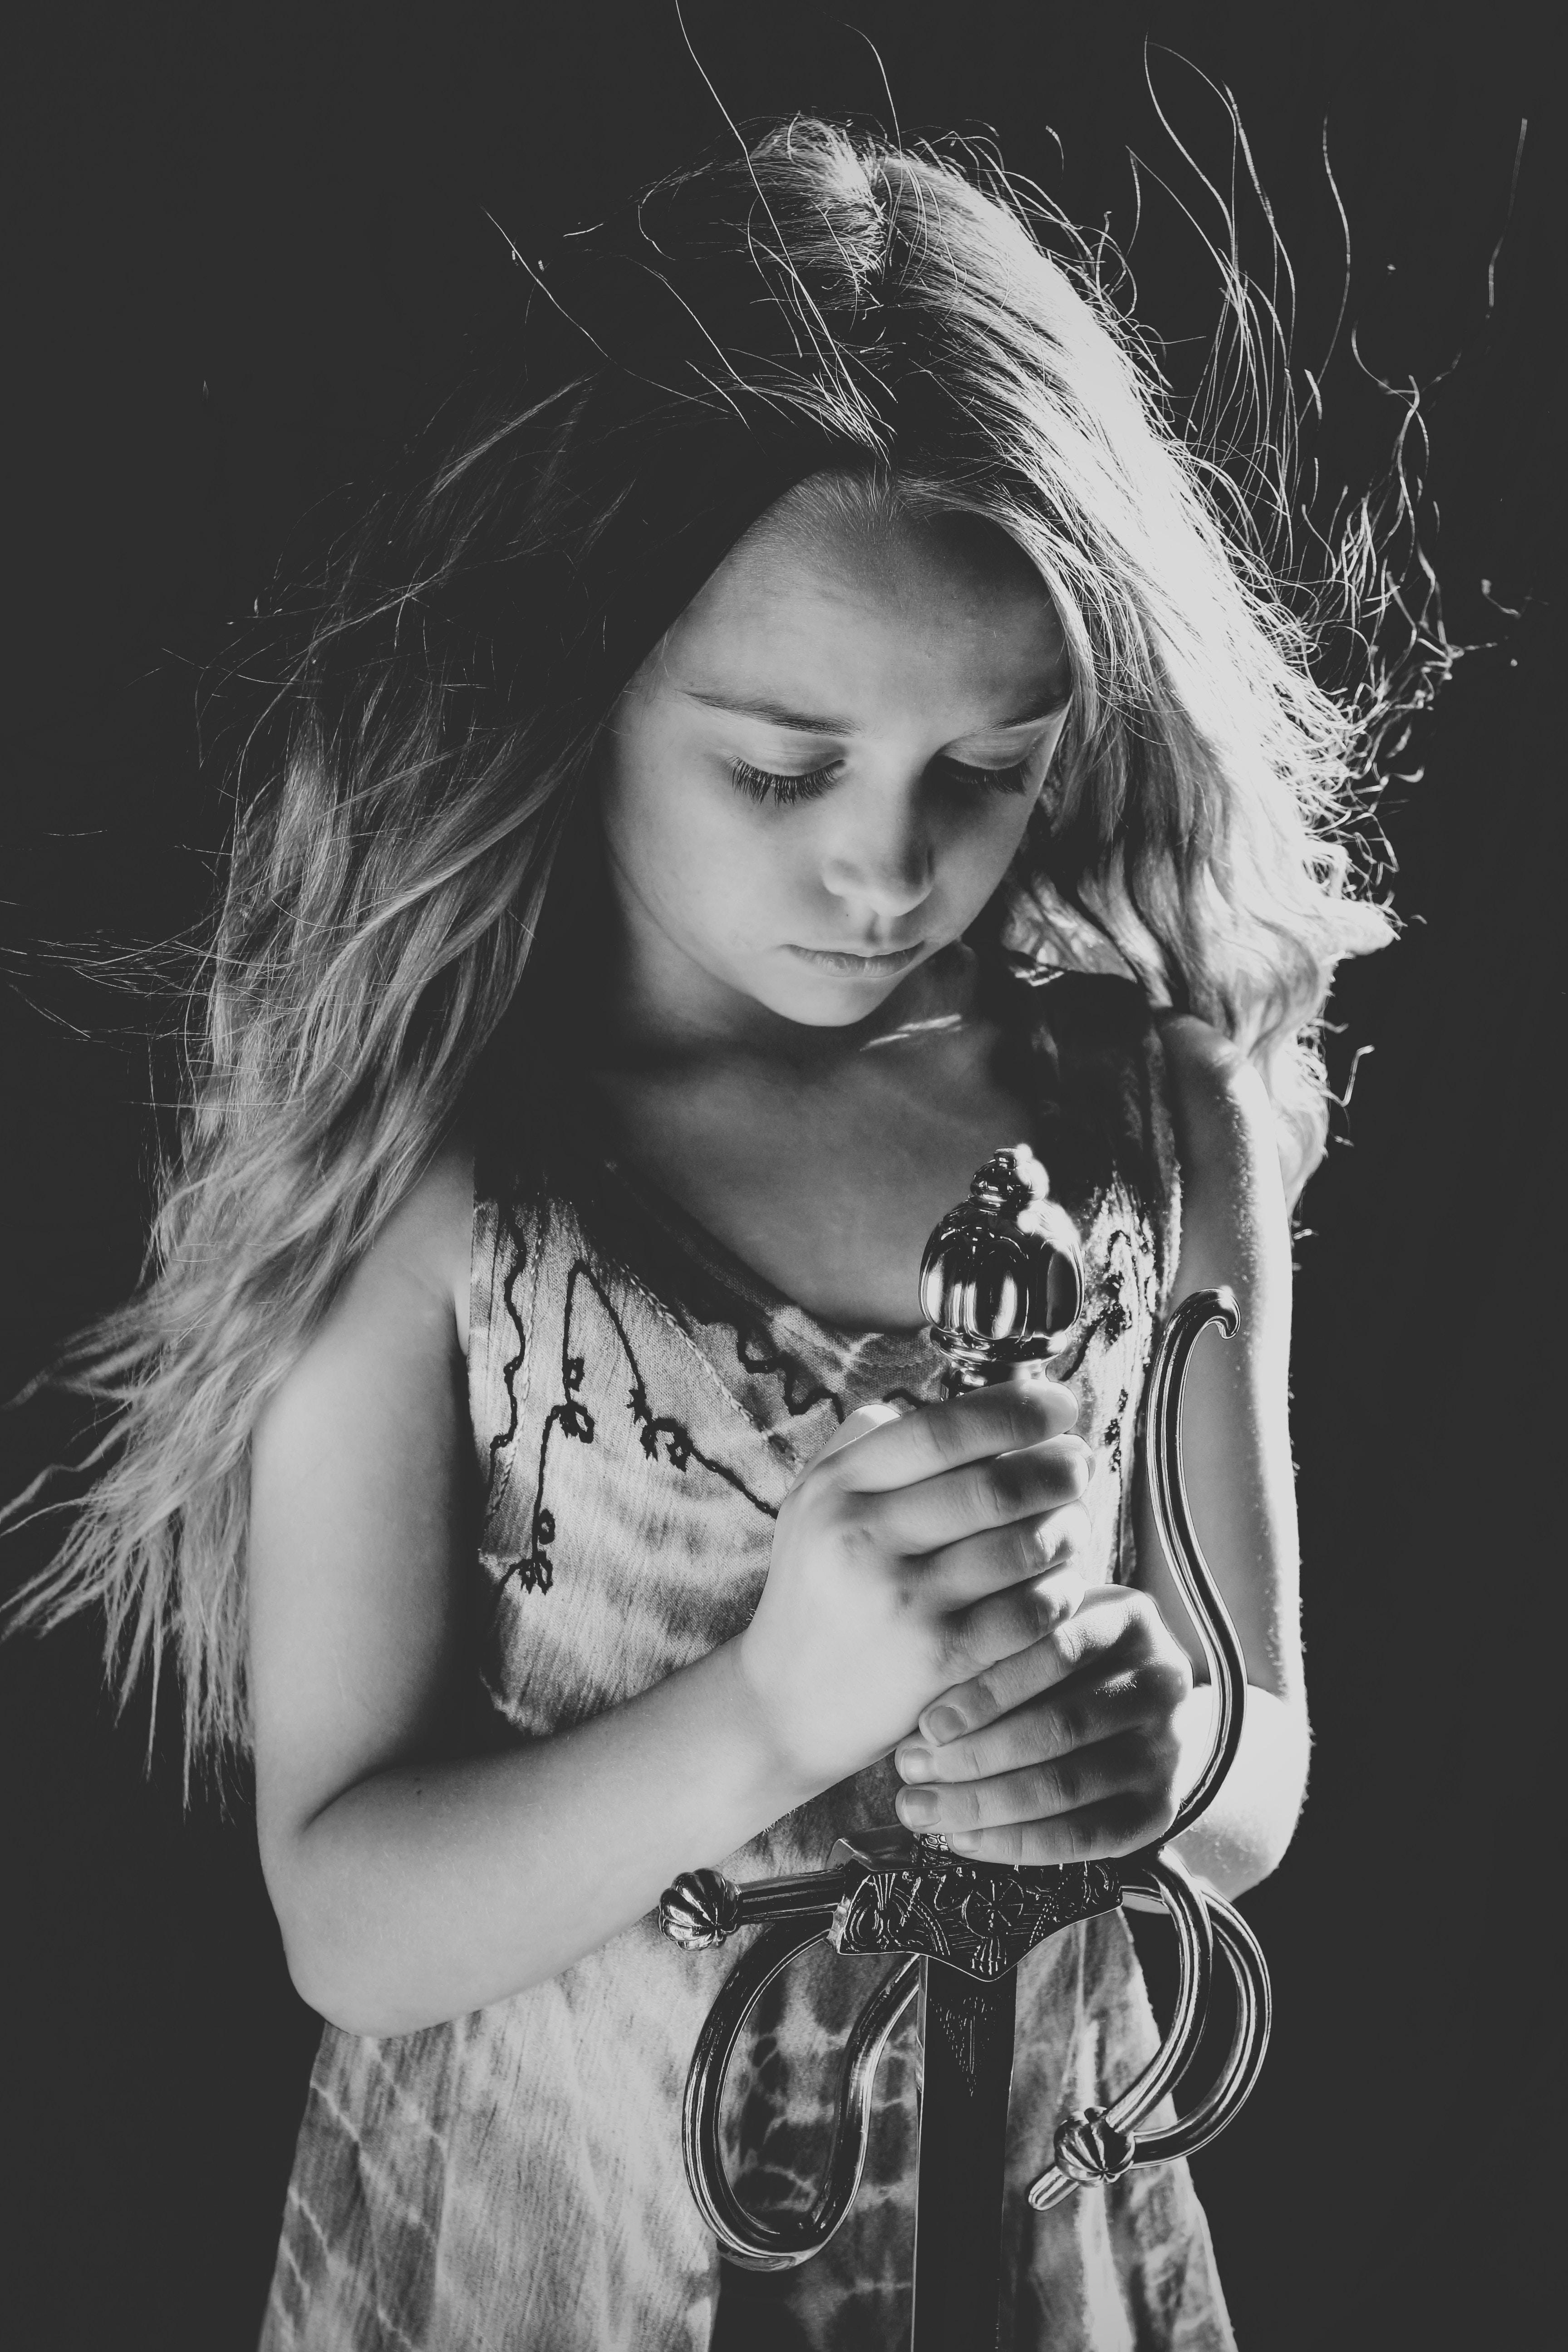 child holding sword